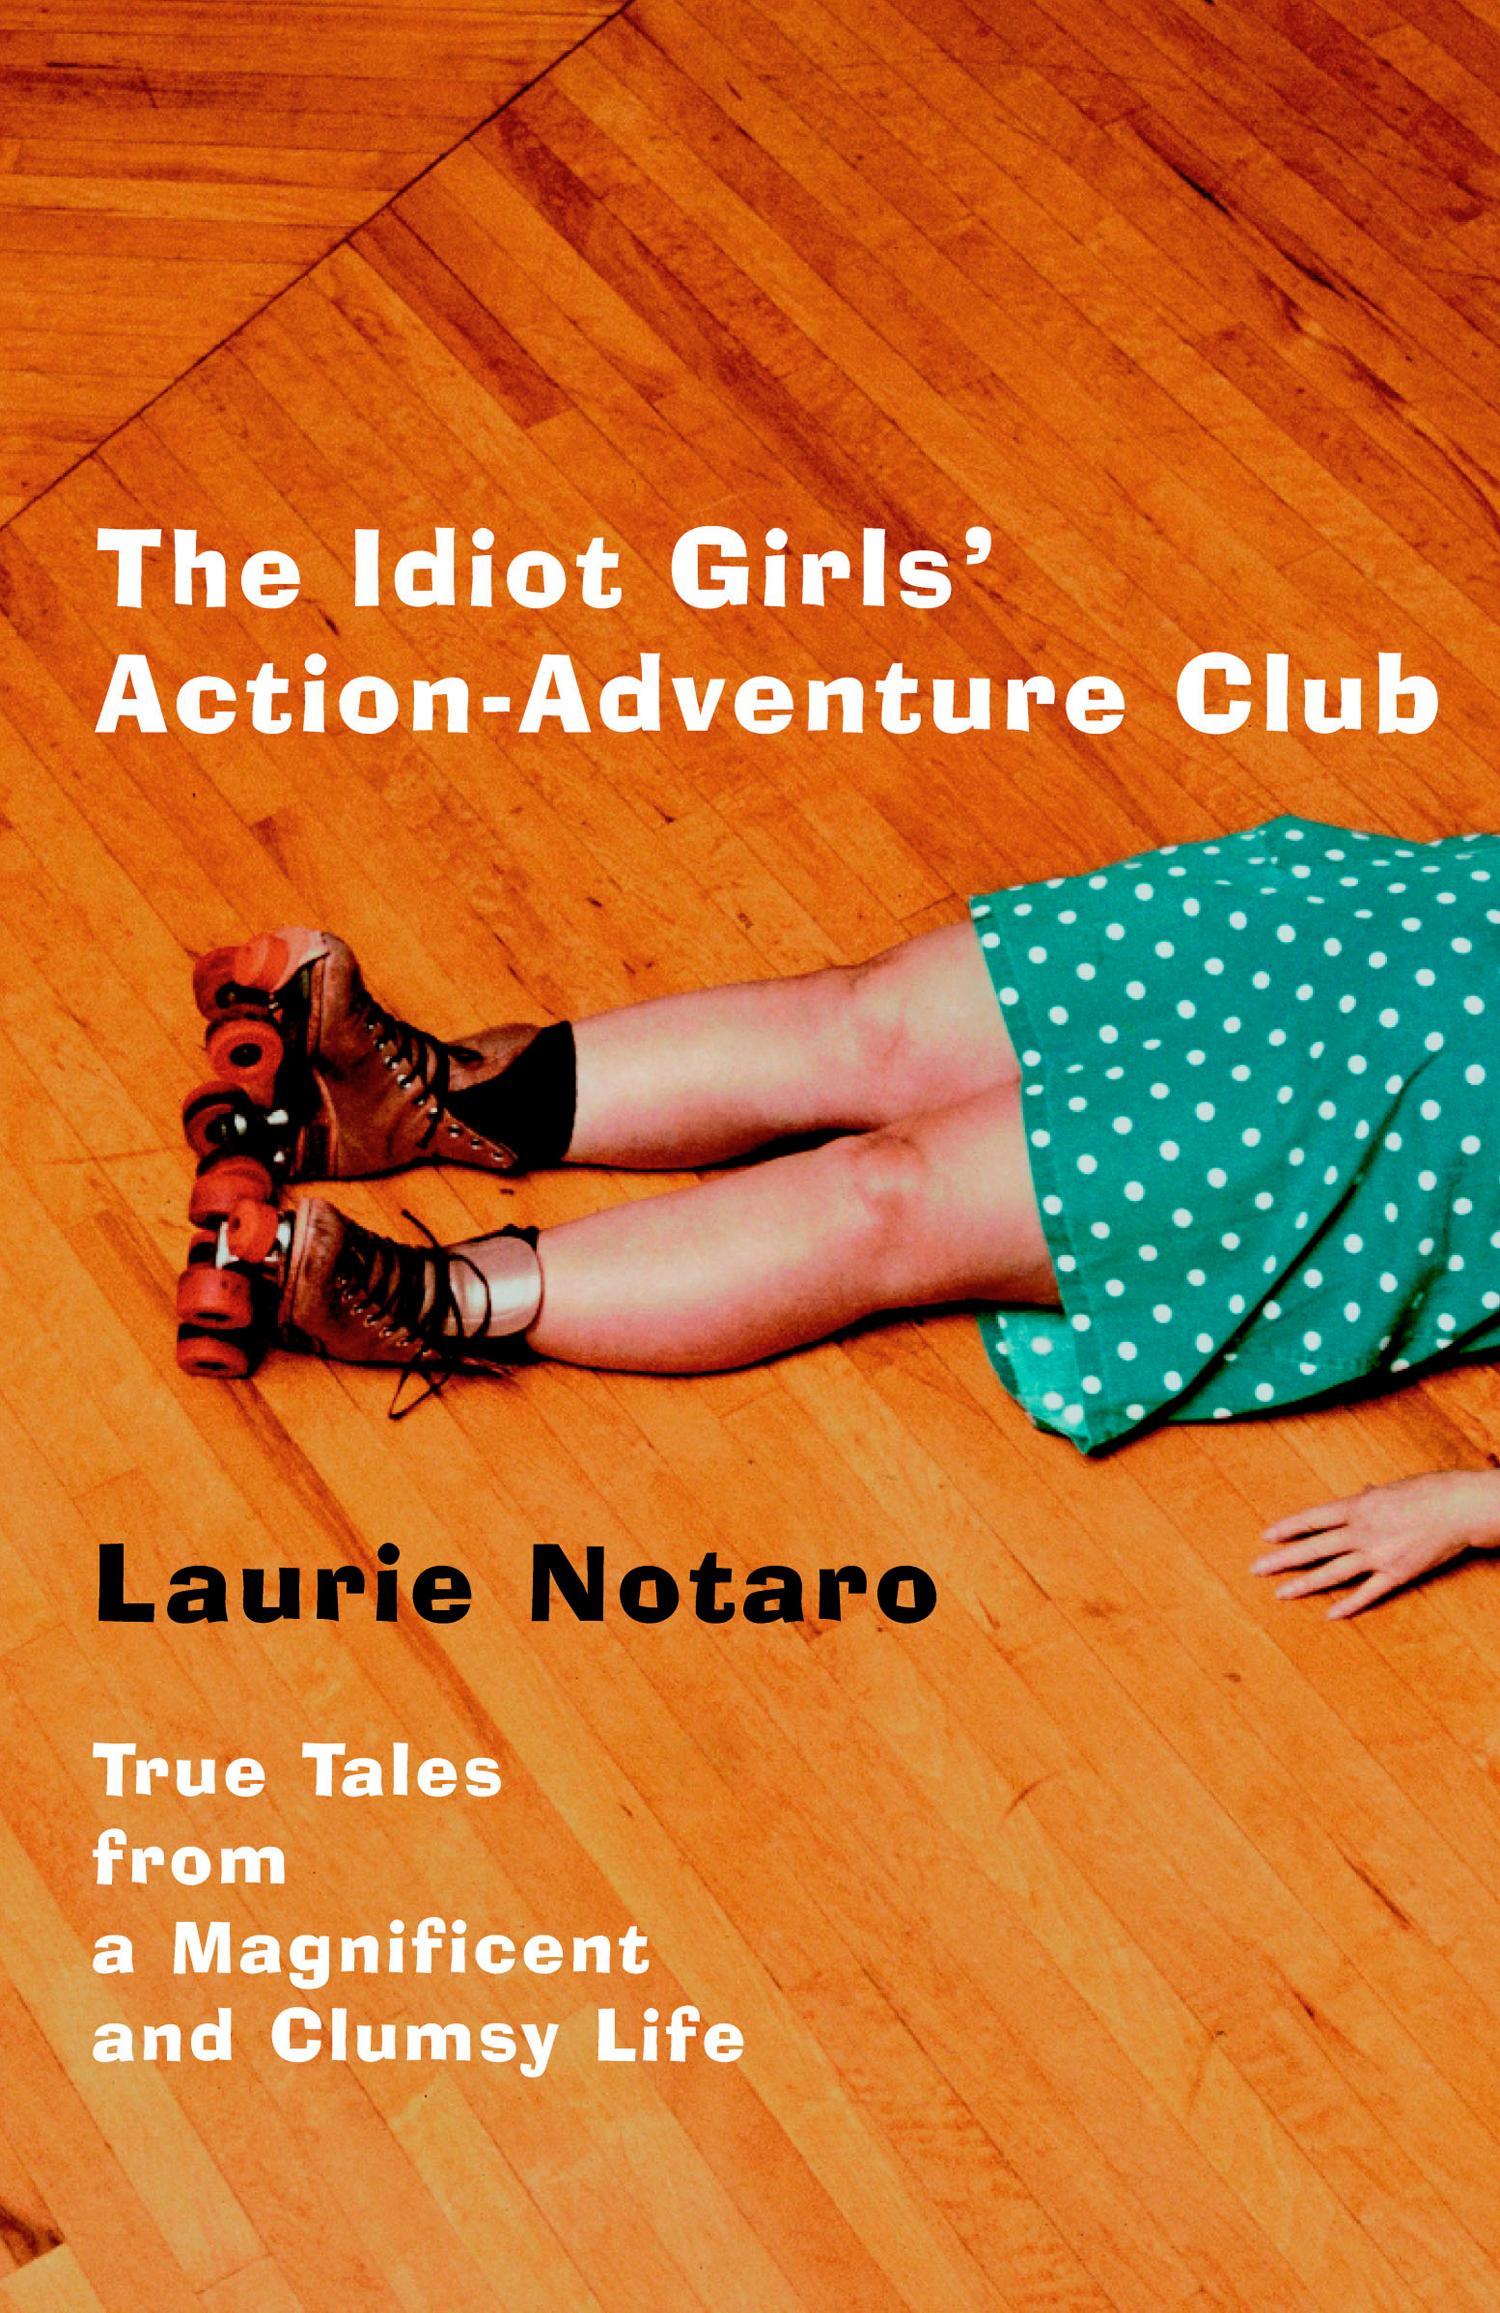 THE-IDIOT-GIRLS-ACTION-ADVENTURE-CLUB-tpb-ss6.jpg